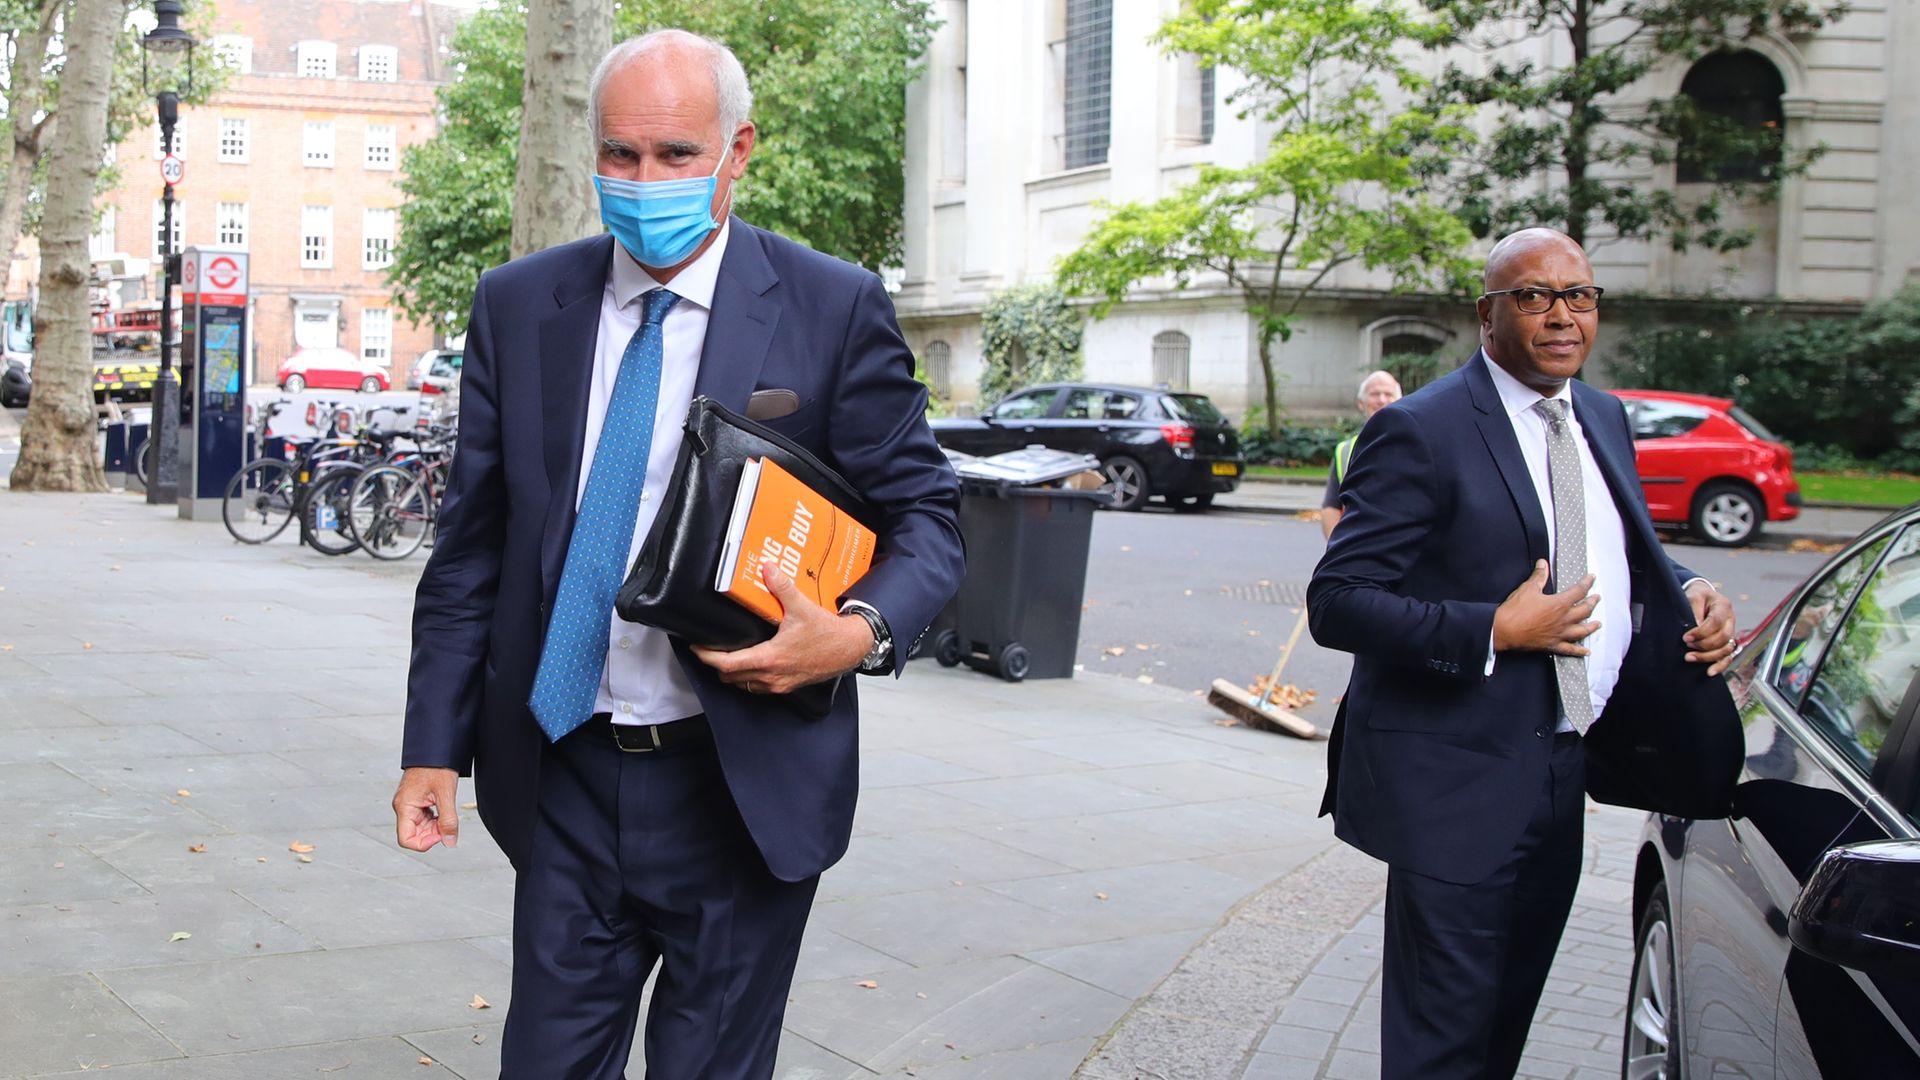 EU Ambassador to the UK, Portuguese diplomat Joao Vale de Almeida (left) arriving at Europe House in Westminster, London. - Credit: PA